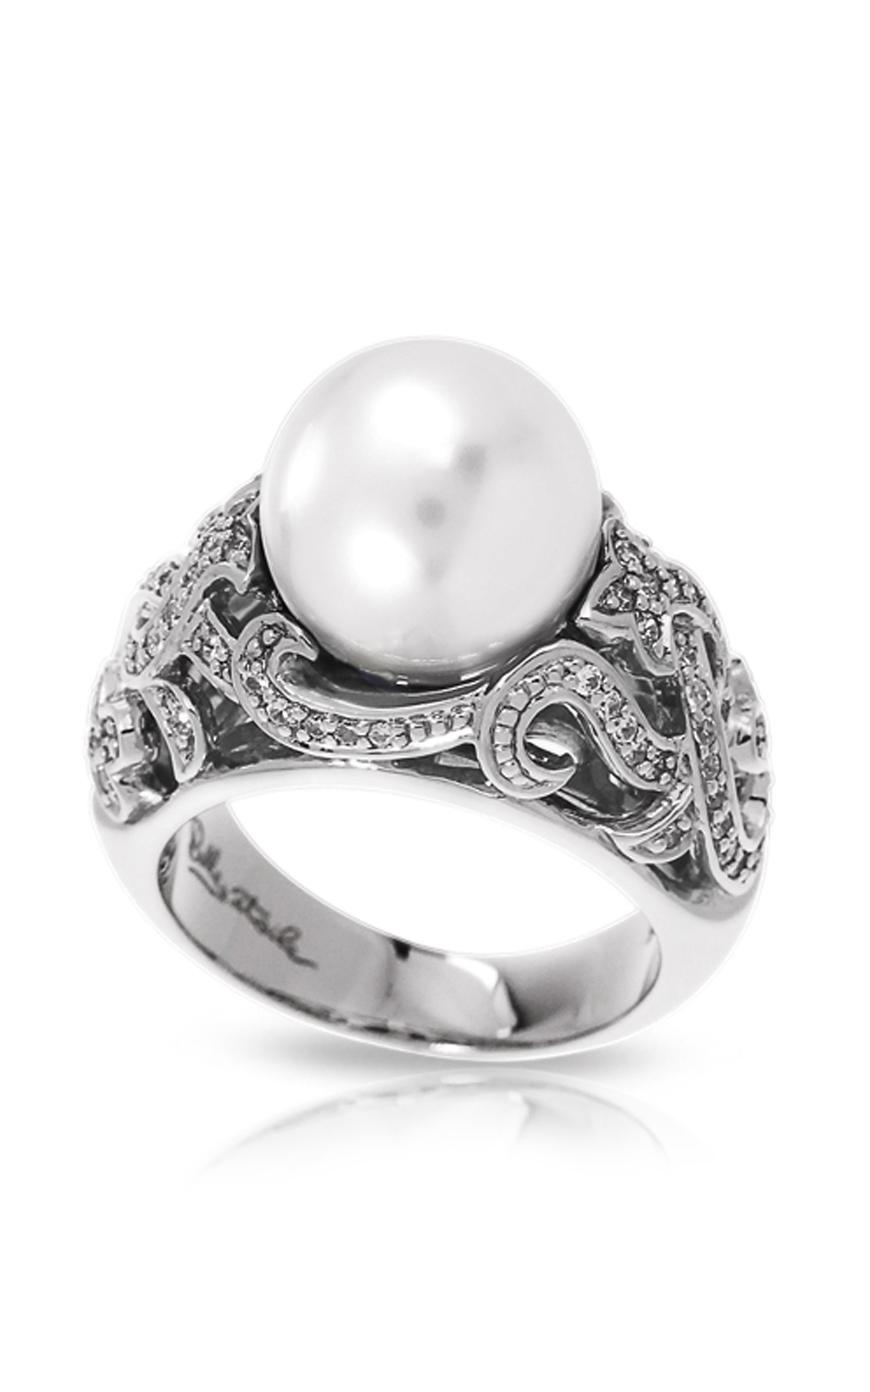 Belle Etoile Fiona White Ring 01031320102-7 product image